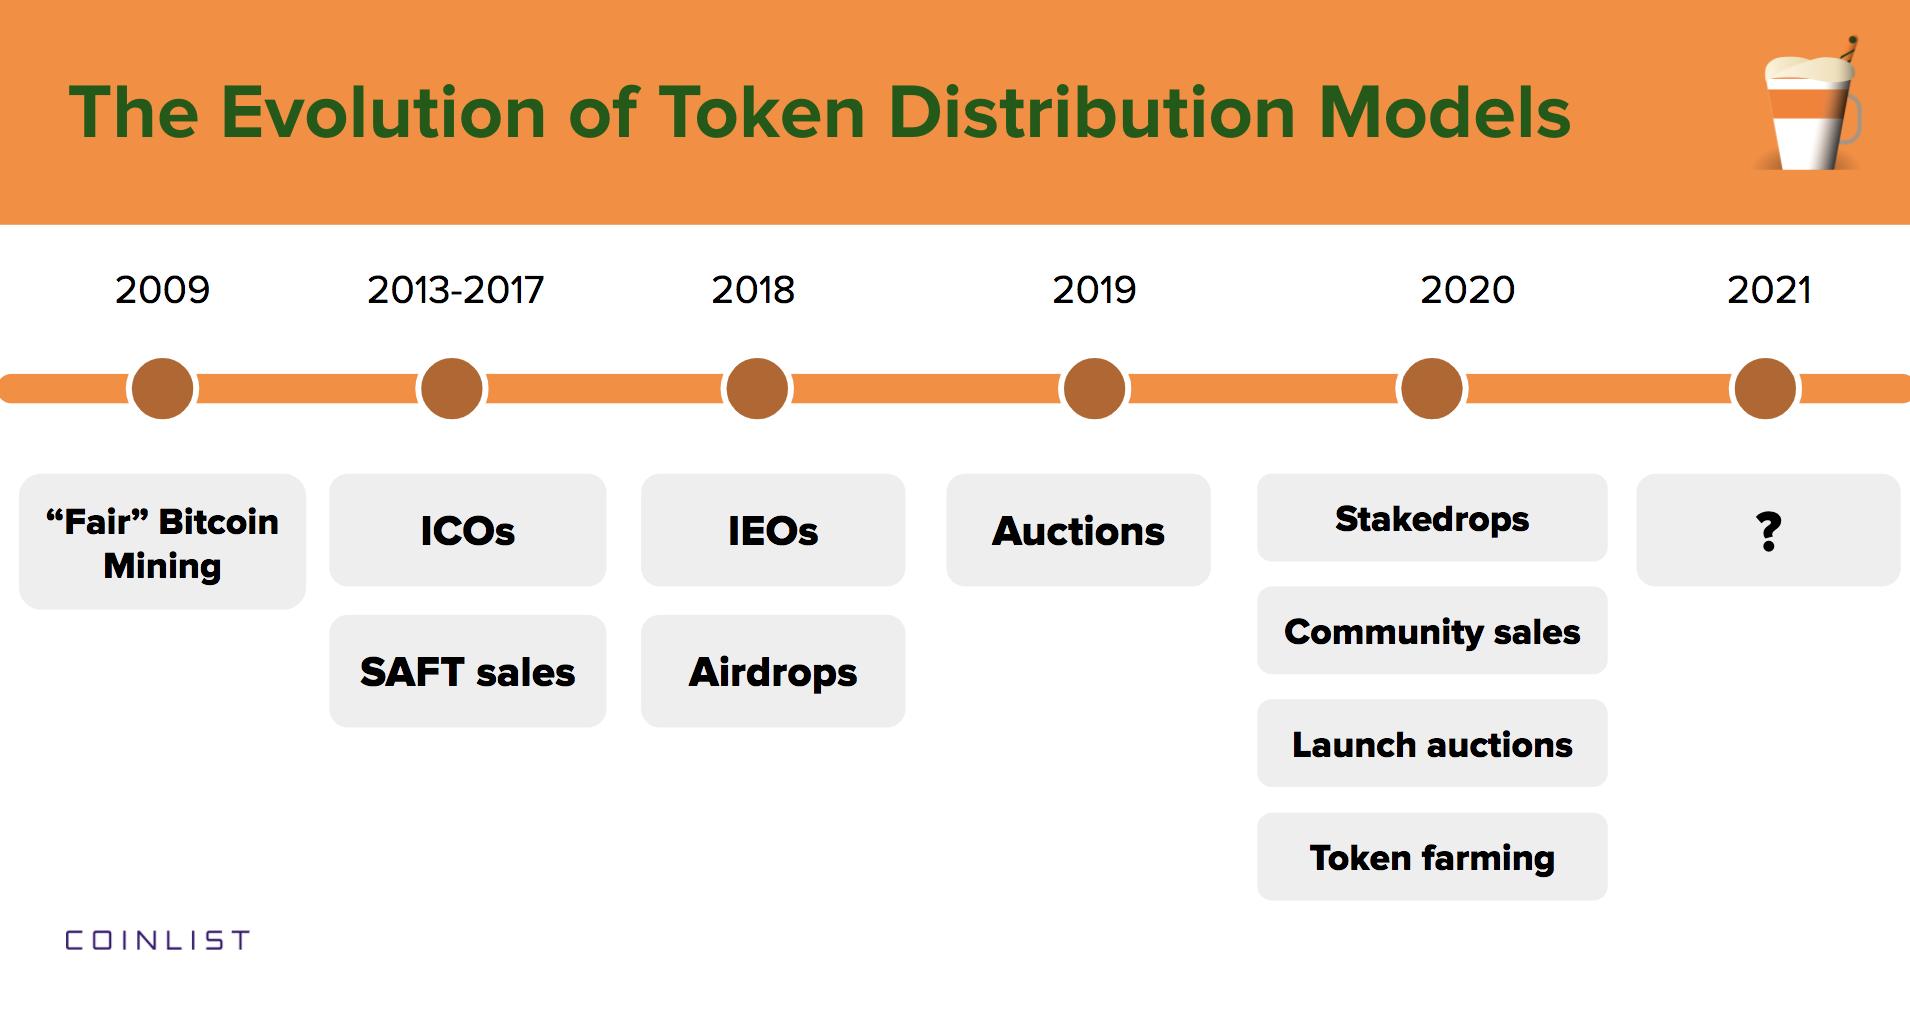 [Coinlist] The Evolution of Token Distribution Models - AZCoin News